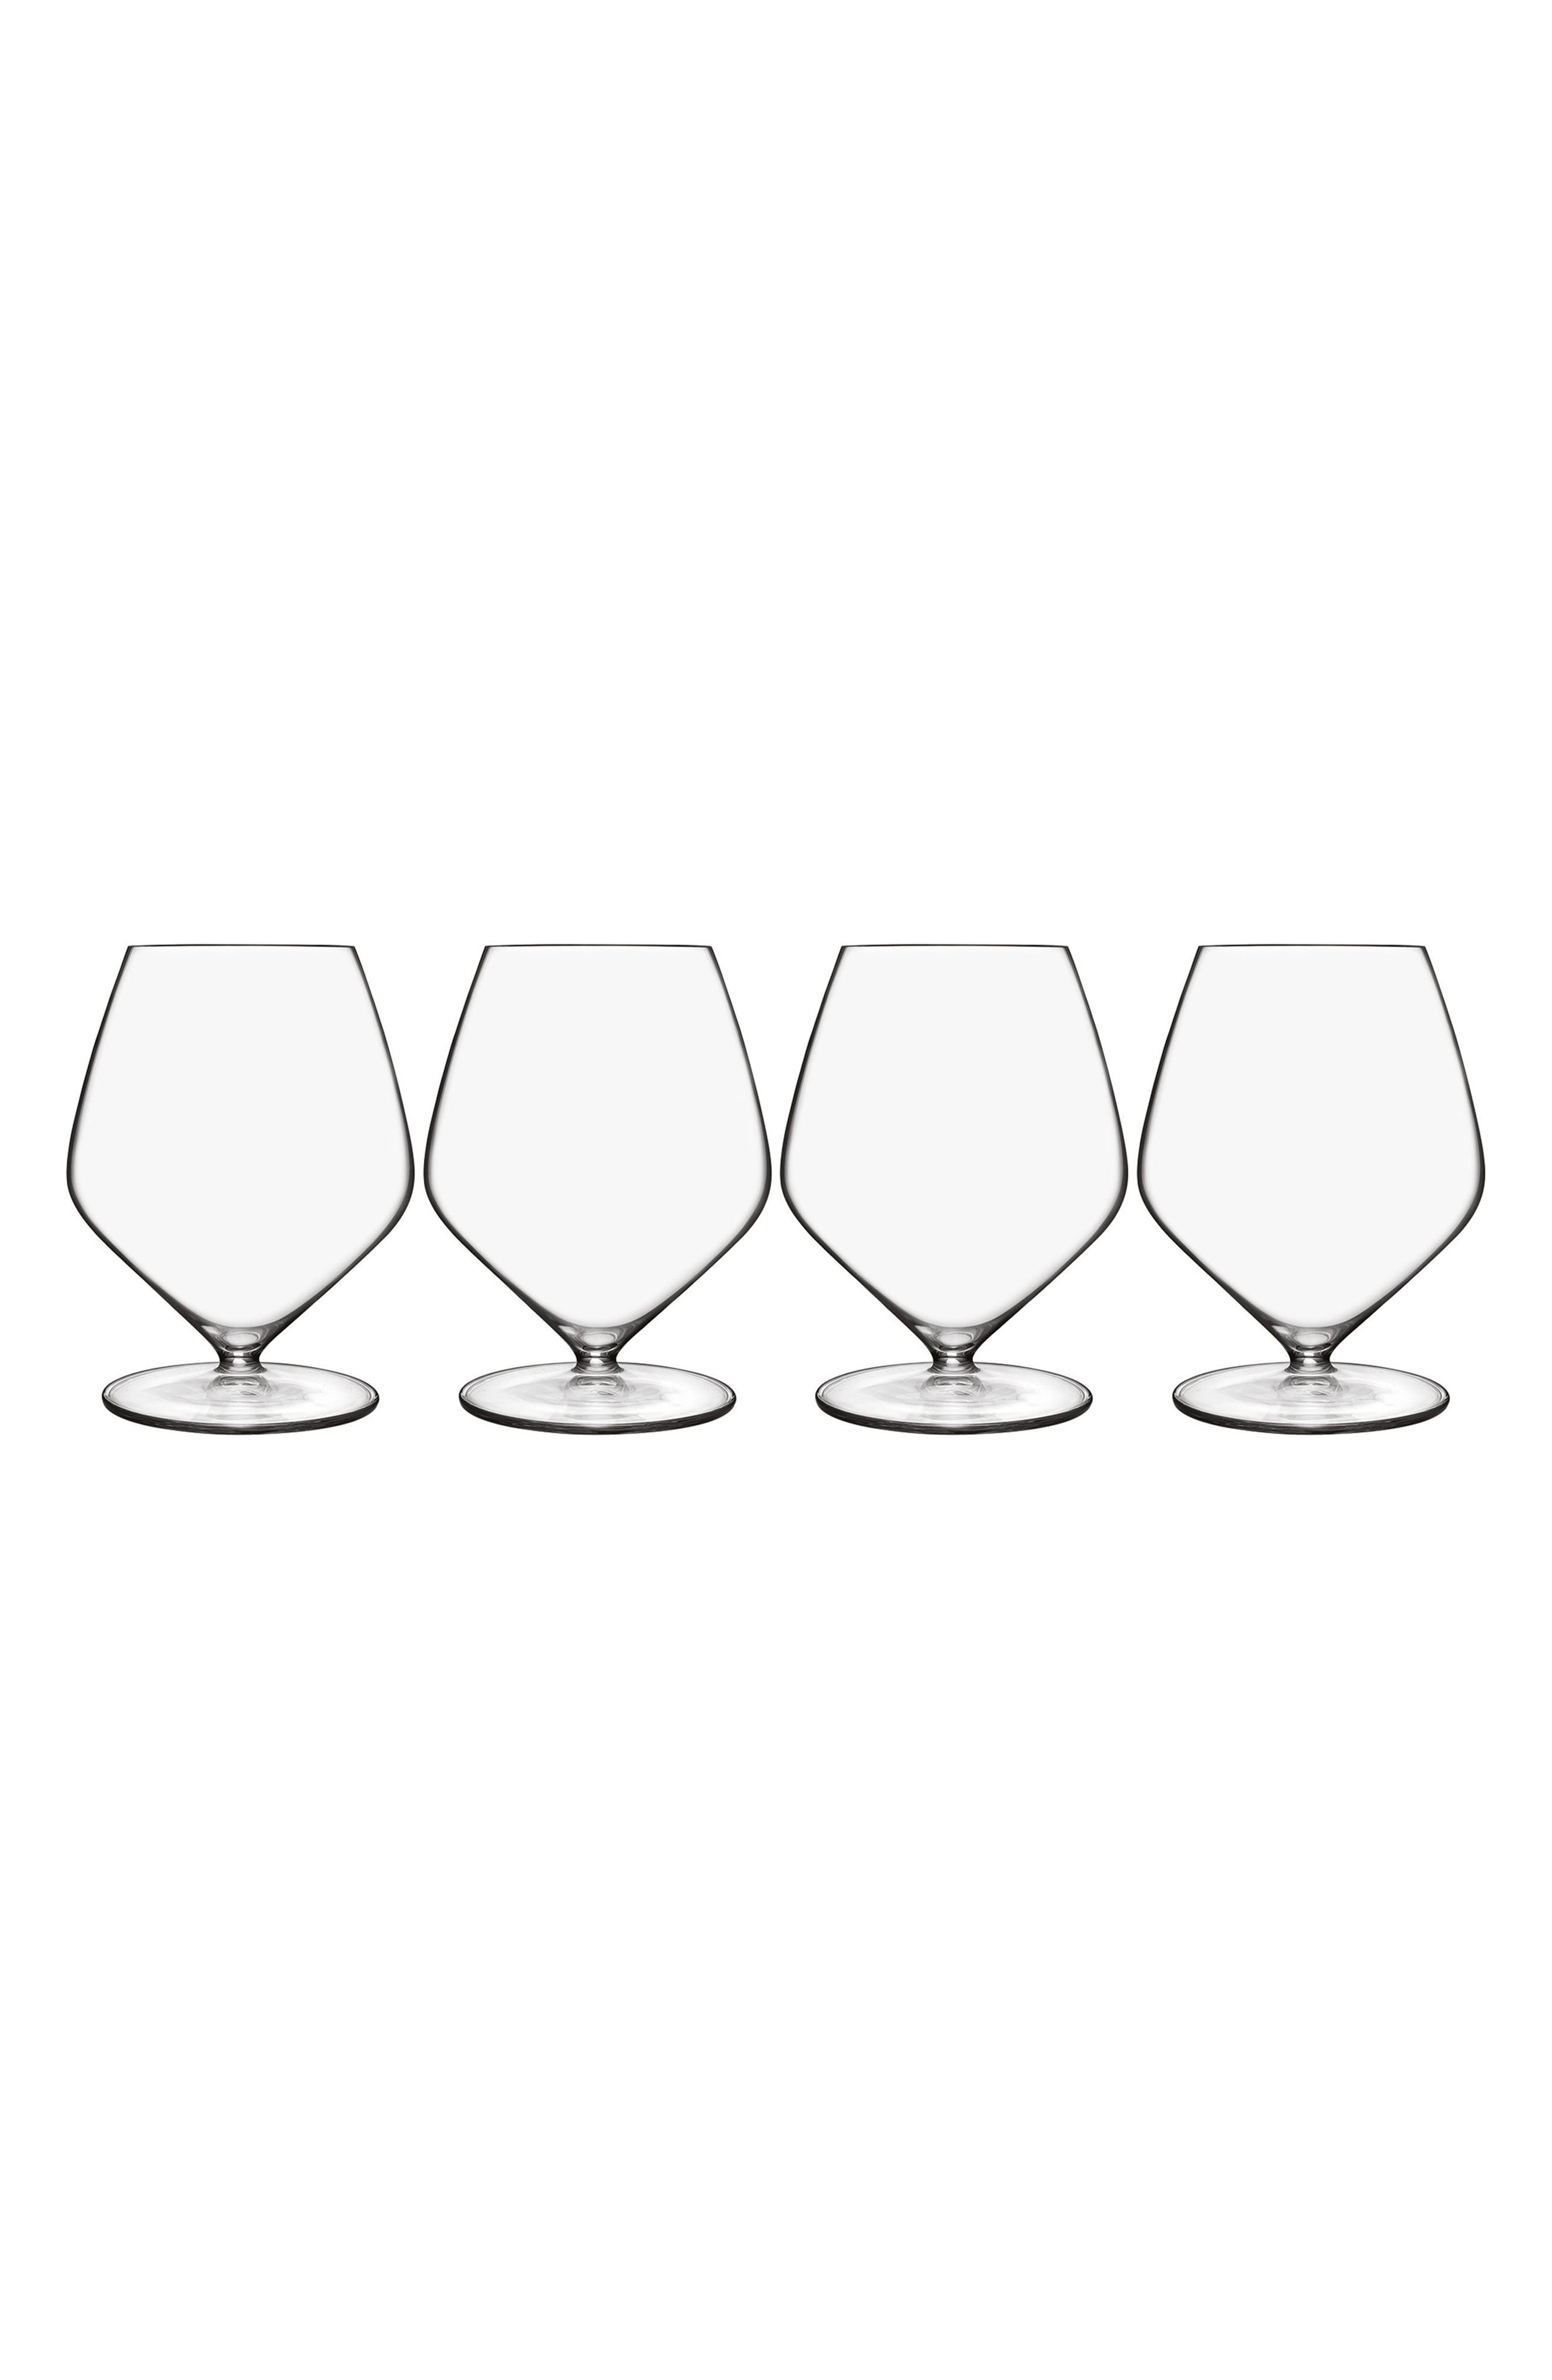 Alternate Image 1 Selected - Luigi Bormioli T-Glass Set of 4 Pinot Noir Glasses